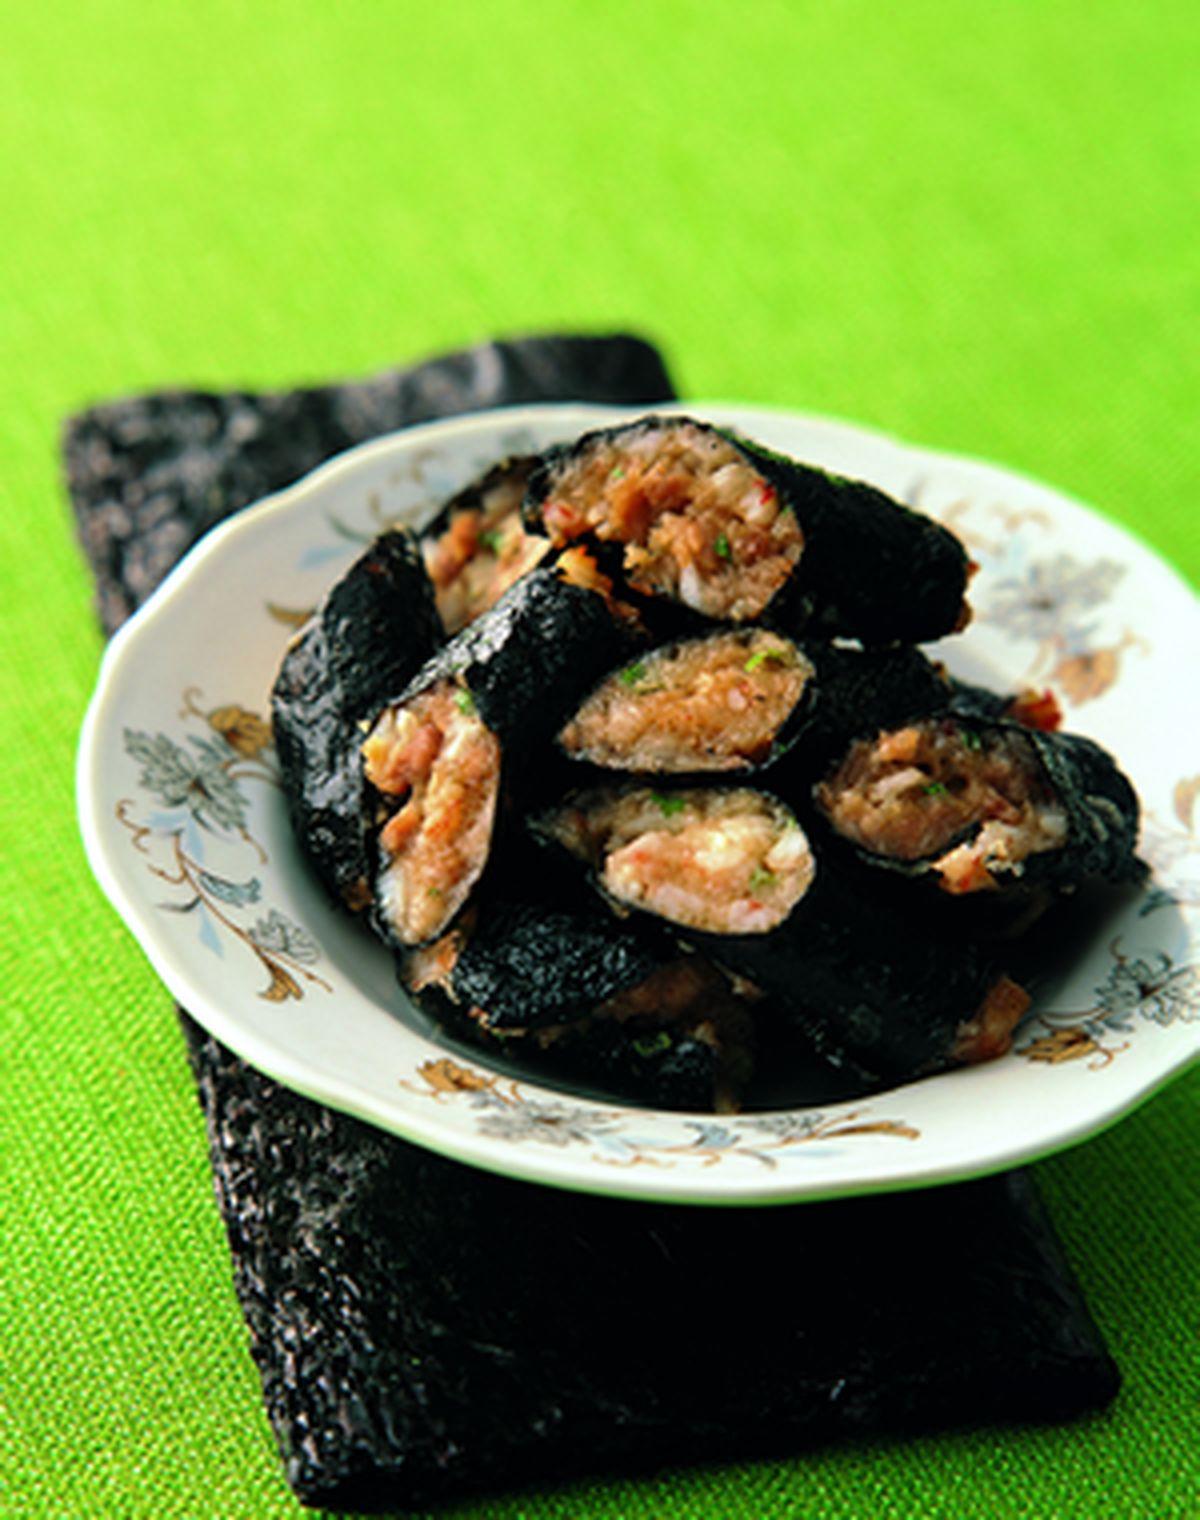 食譜:海苔蝦卷